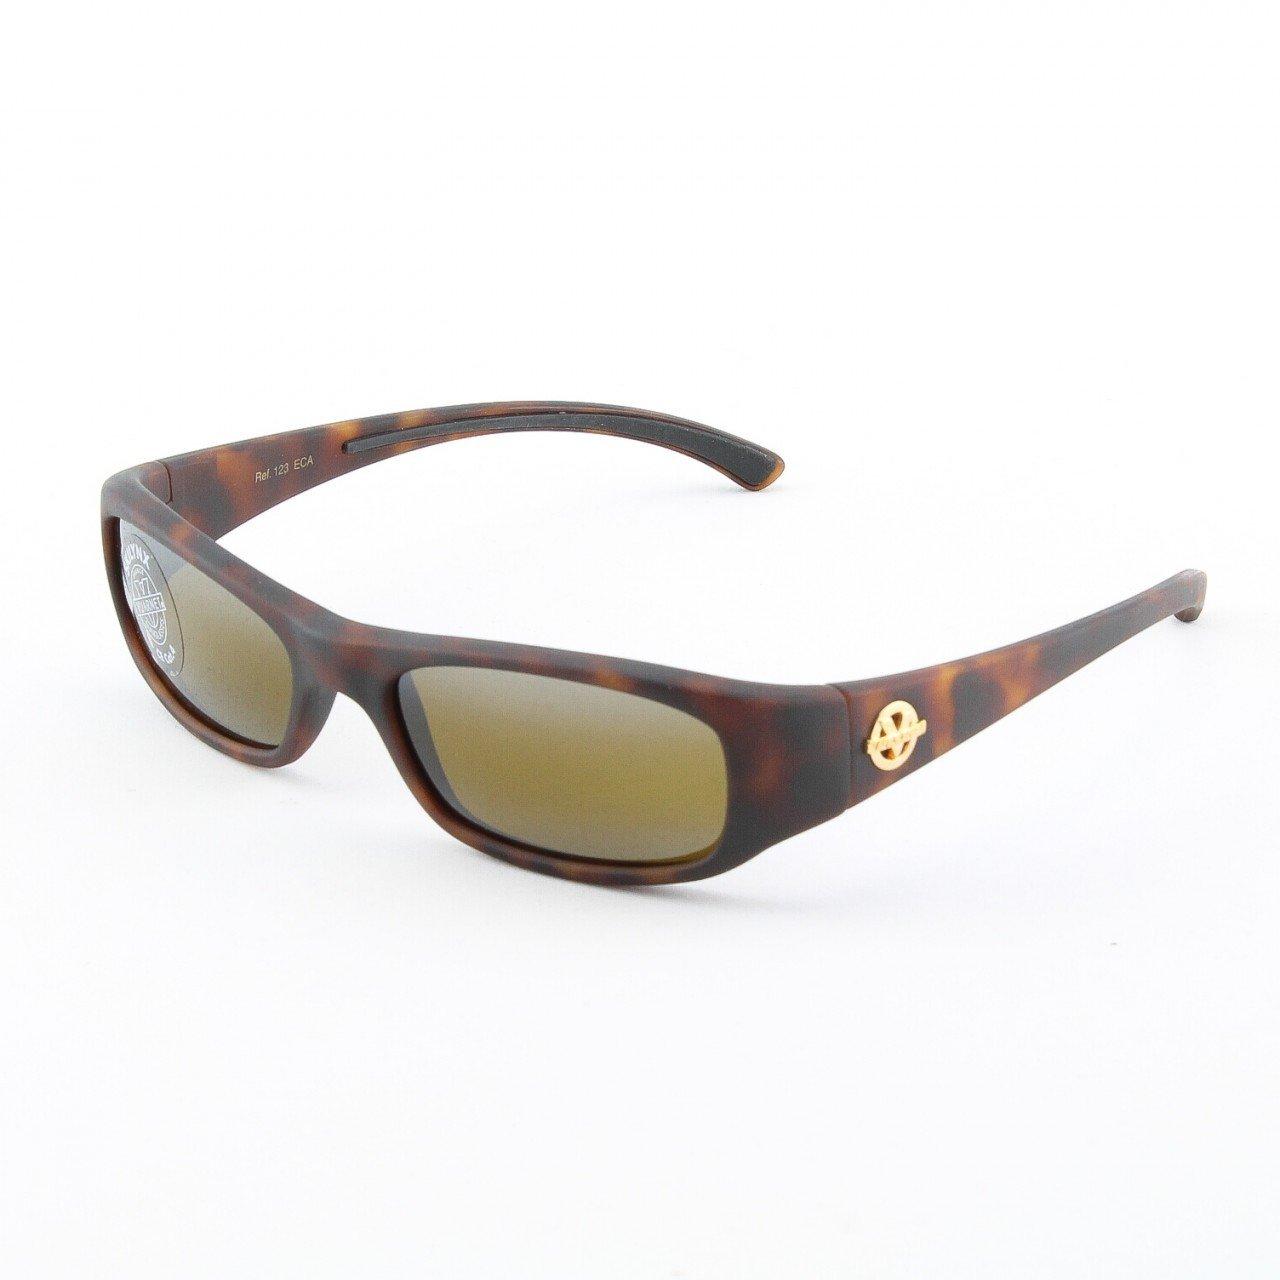 VUARNET 4123 ECA Sunglasses Col. Dark Havana with Brown Skilynx Lenses